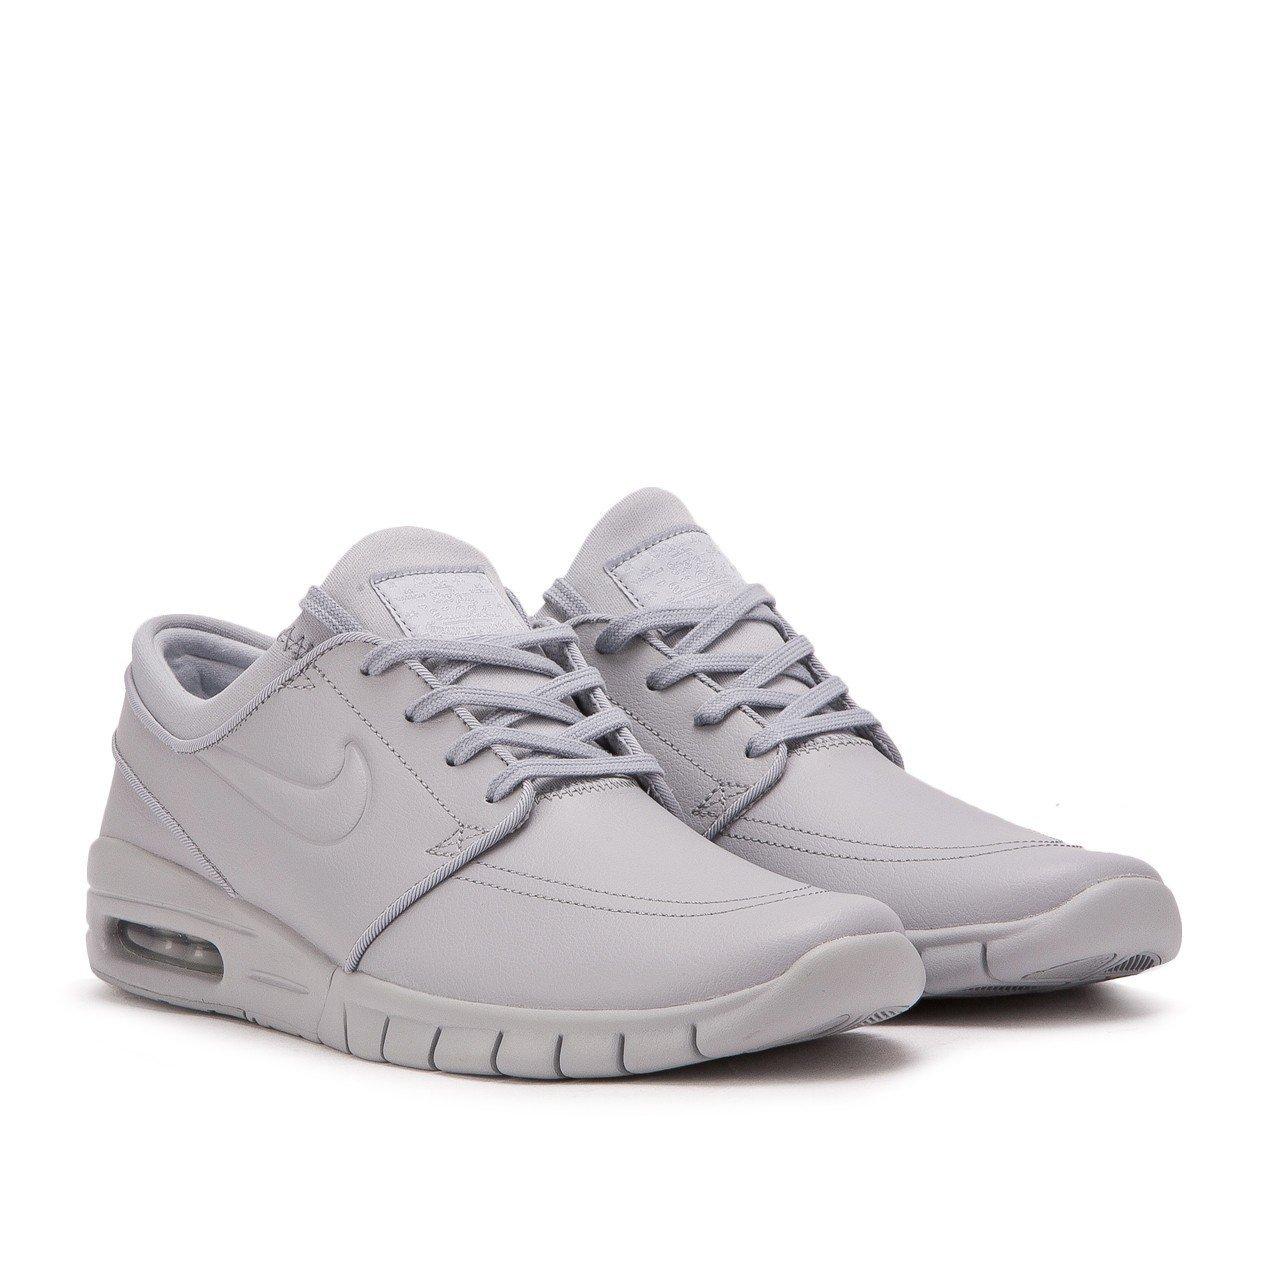 cheap for discount 4e136 fcd4d Nike SB Stefan Janoski Max L - 685299-012 - Grey - UK 13  Amazon.co.uk   Shoes   Bags